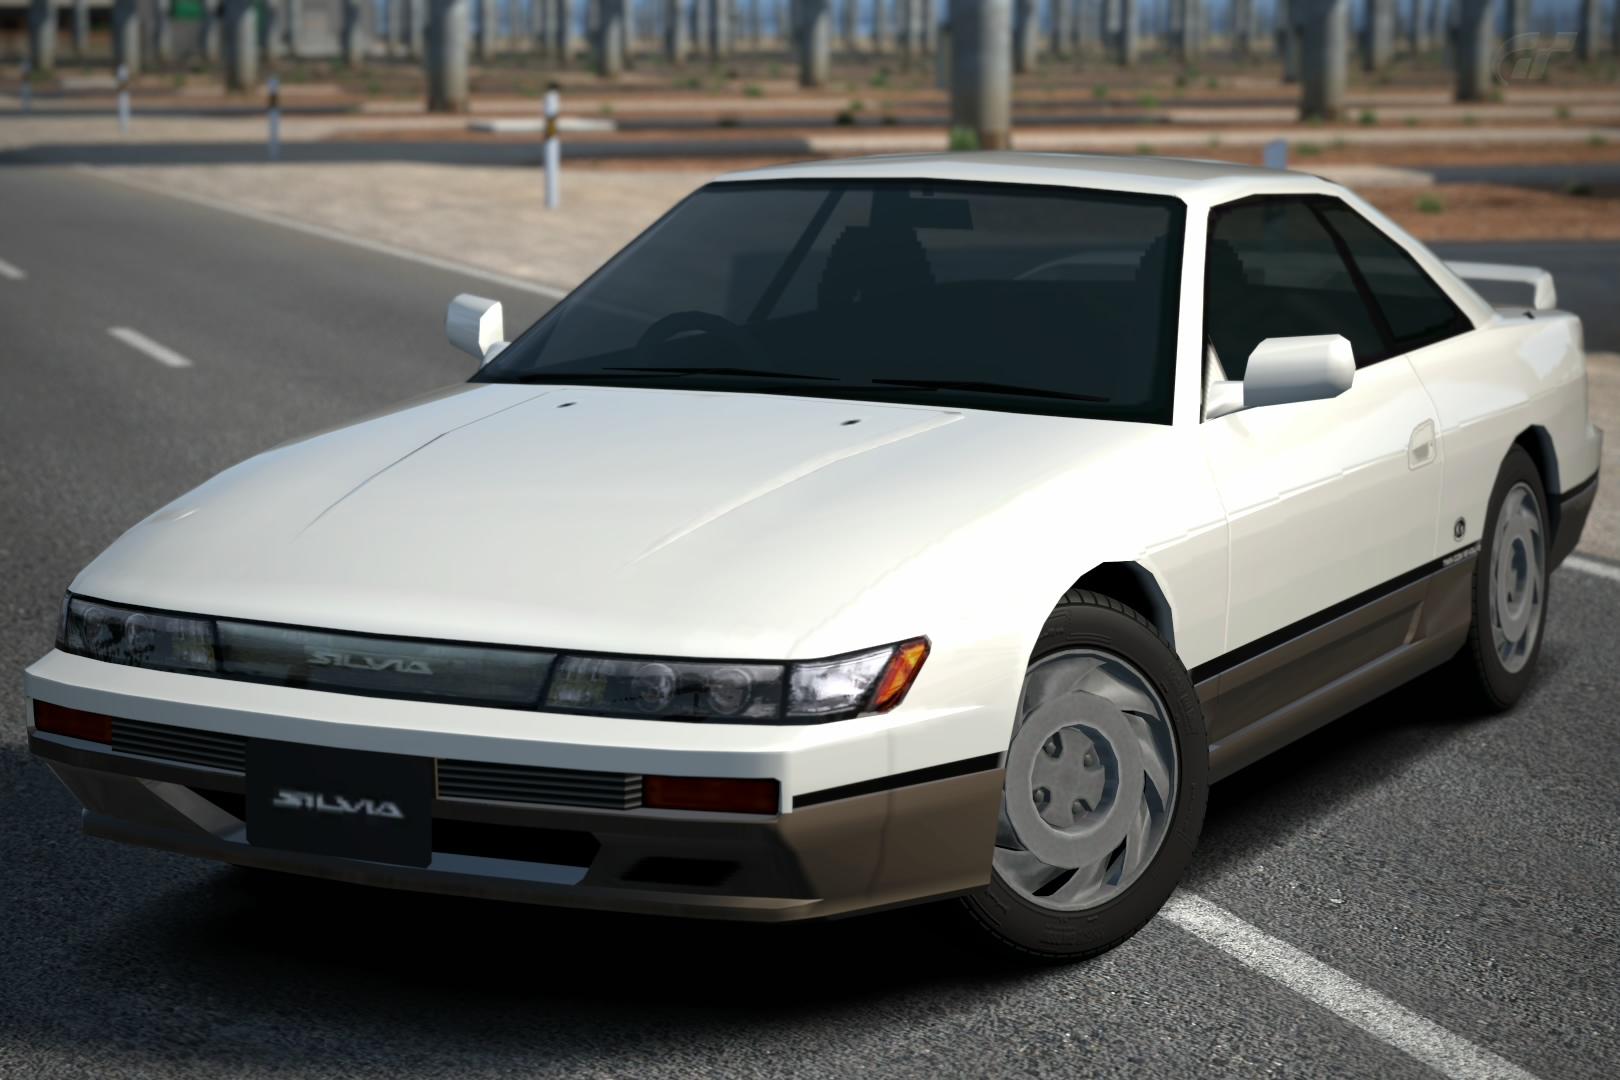 Nissan Silvia K S S13 88 Gran Turismo Wiki Fandom